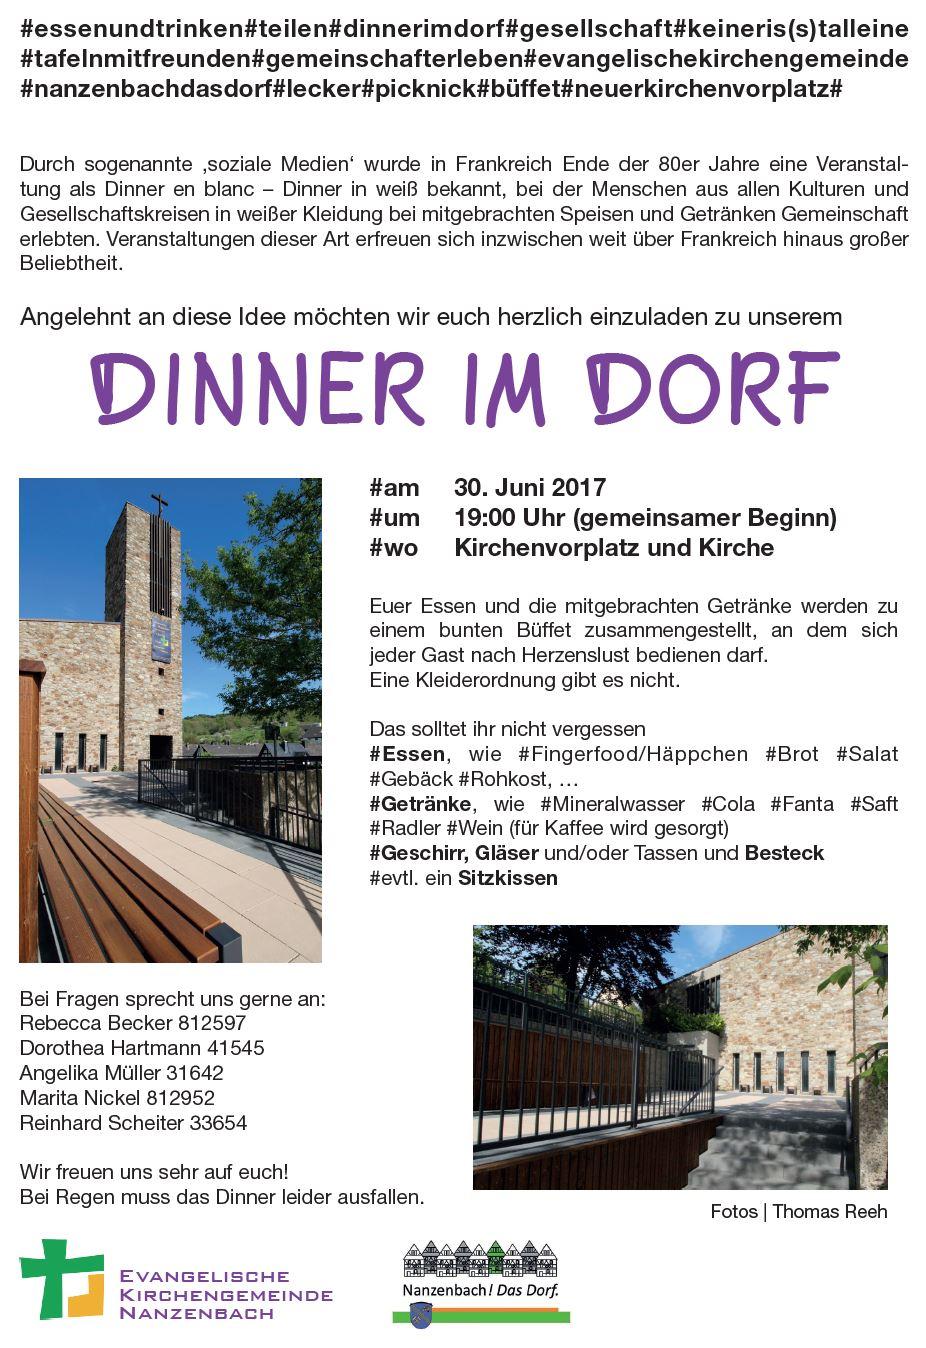 Nanzenbach.eu - Einladung zu Dinner im Dorf am 30.06.2017